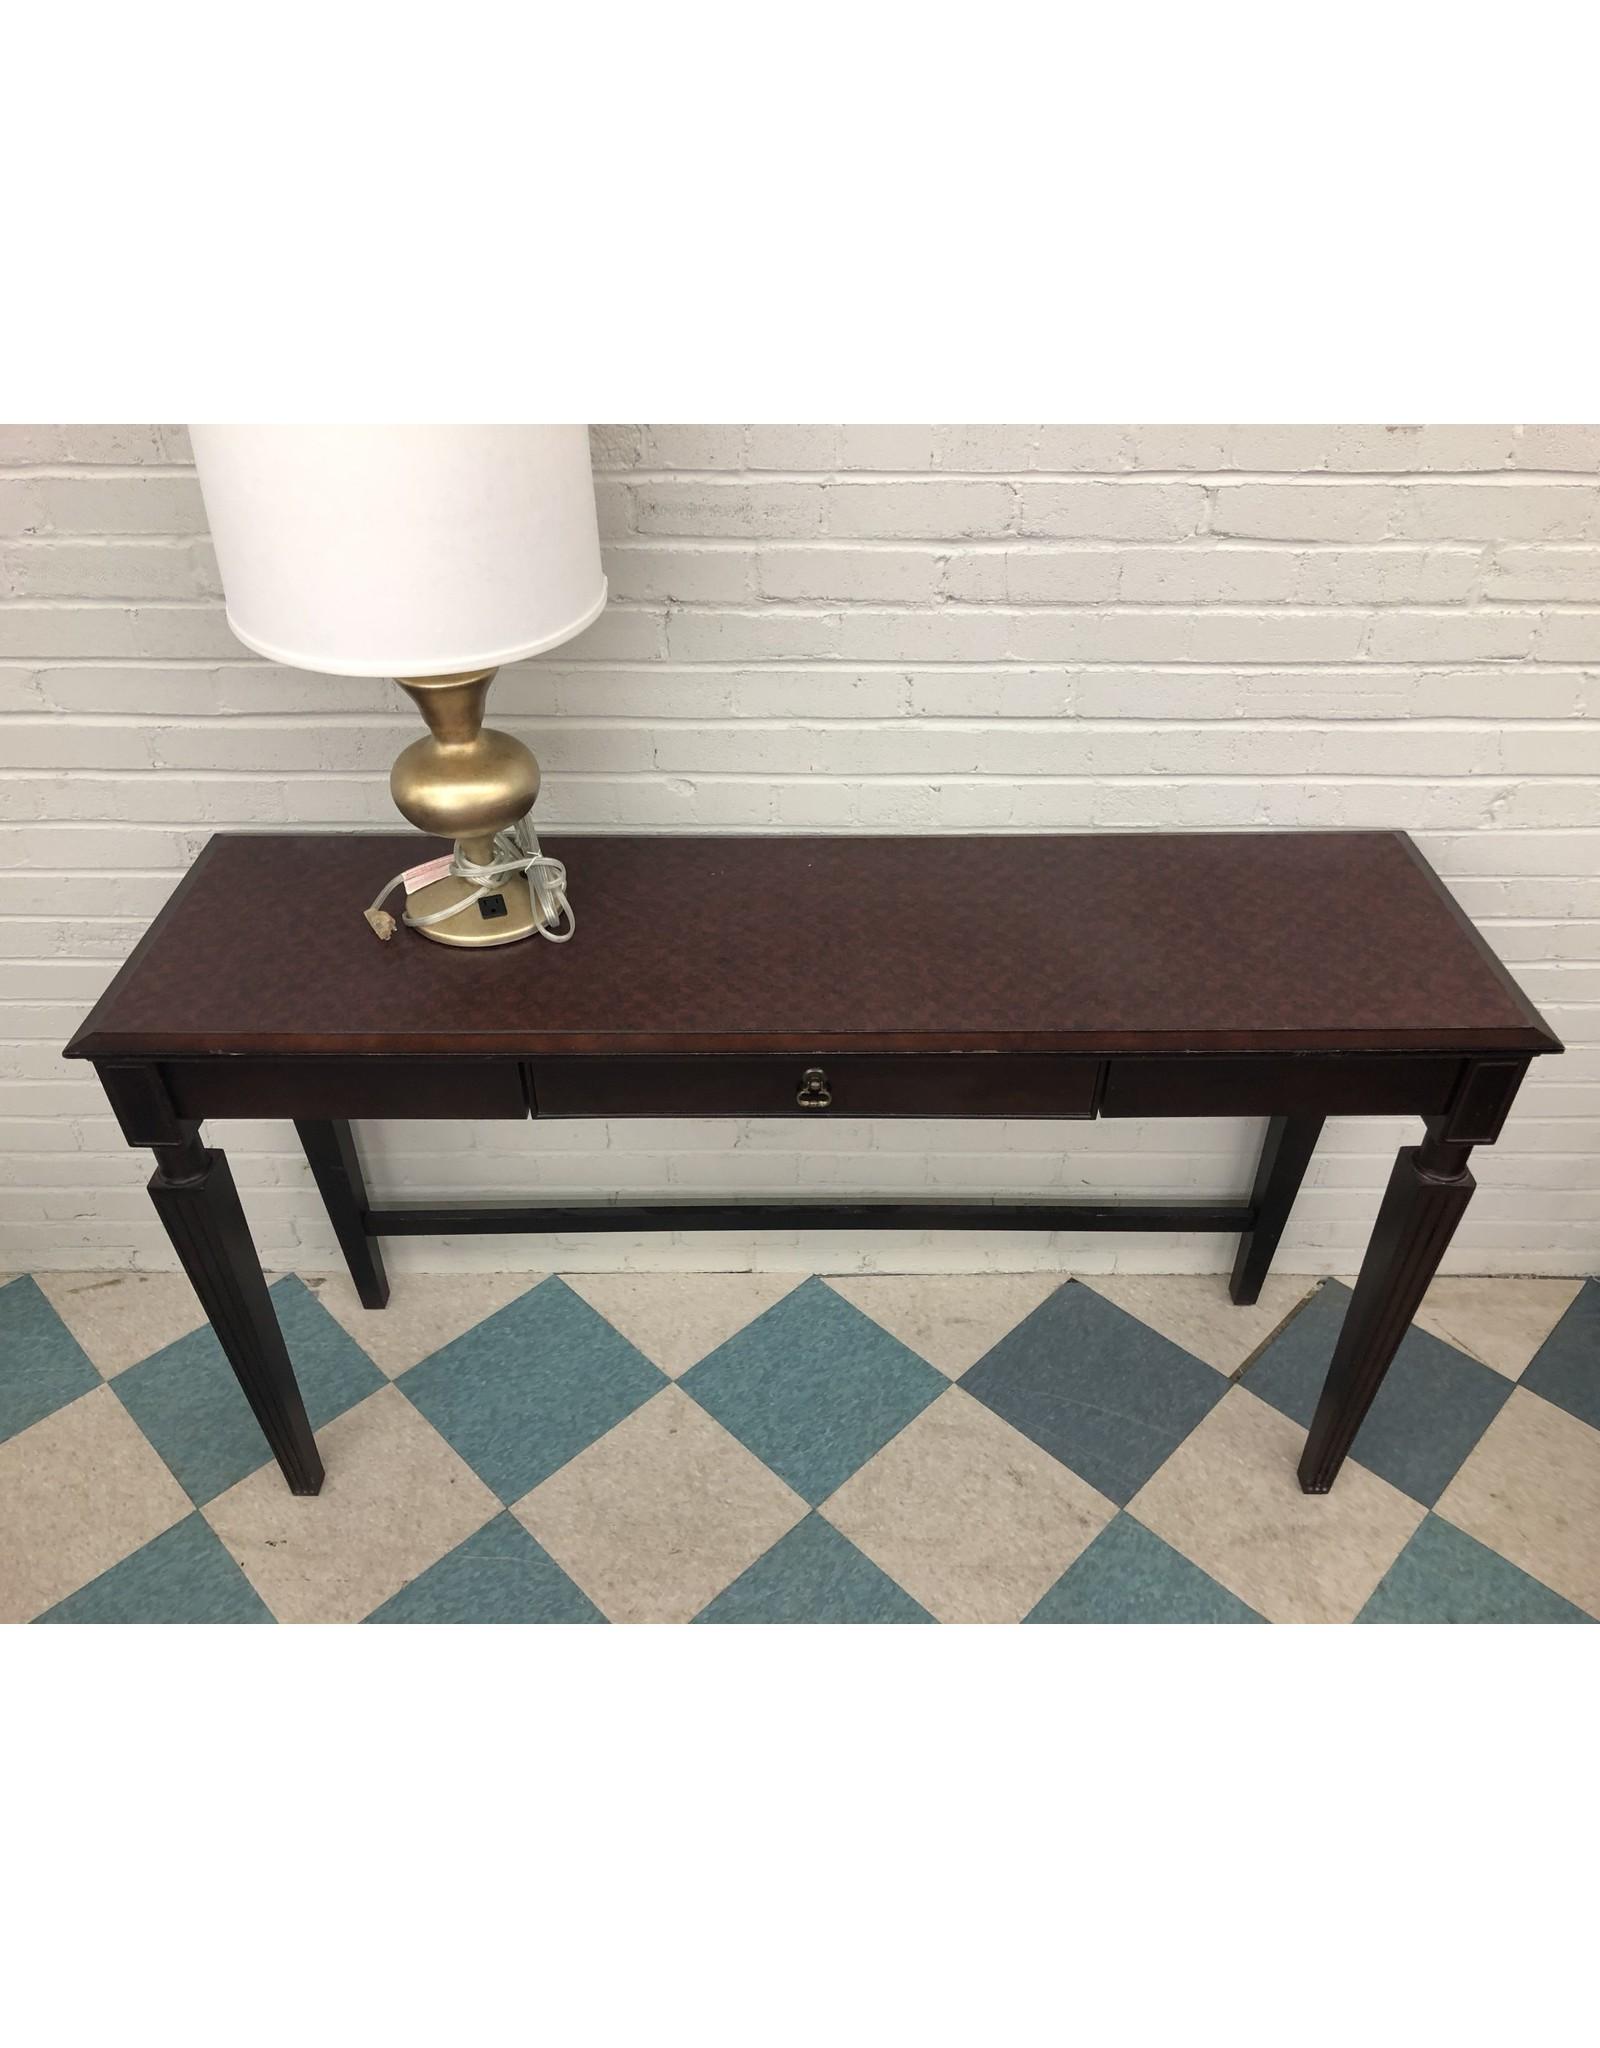 Plantation FT-Sofa Table